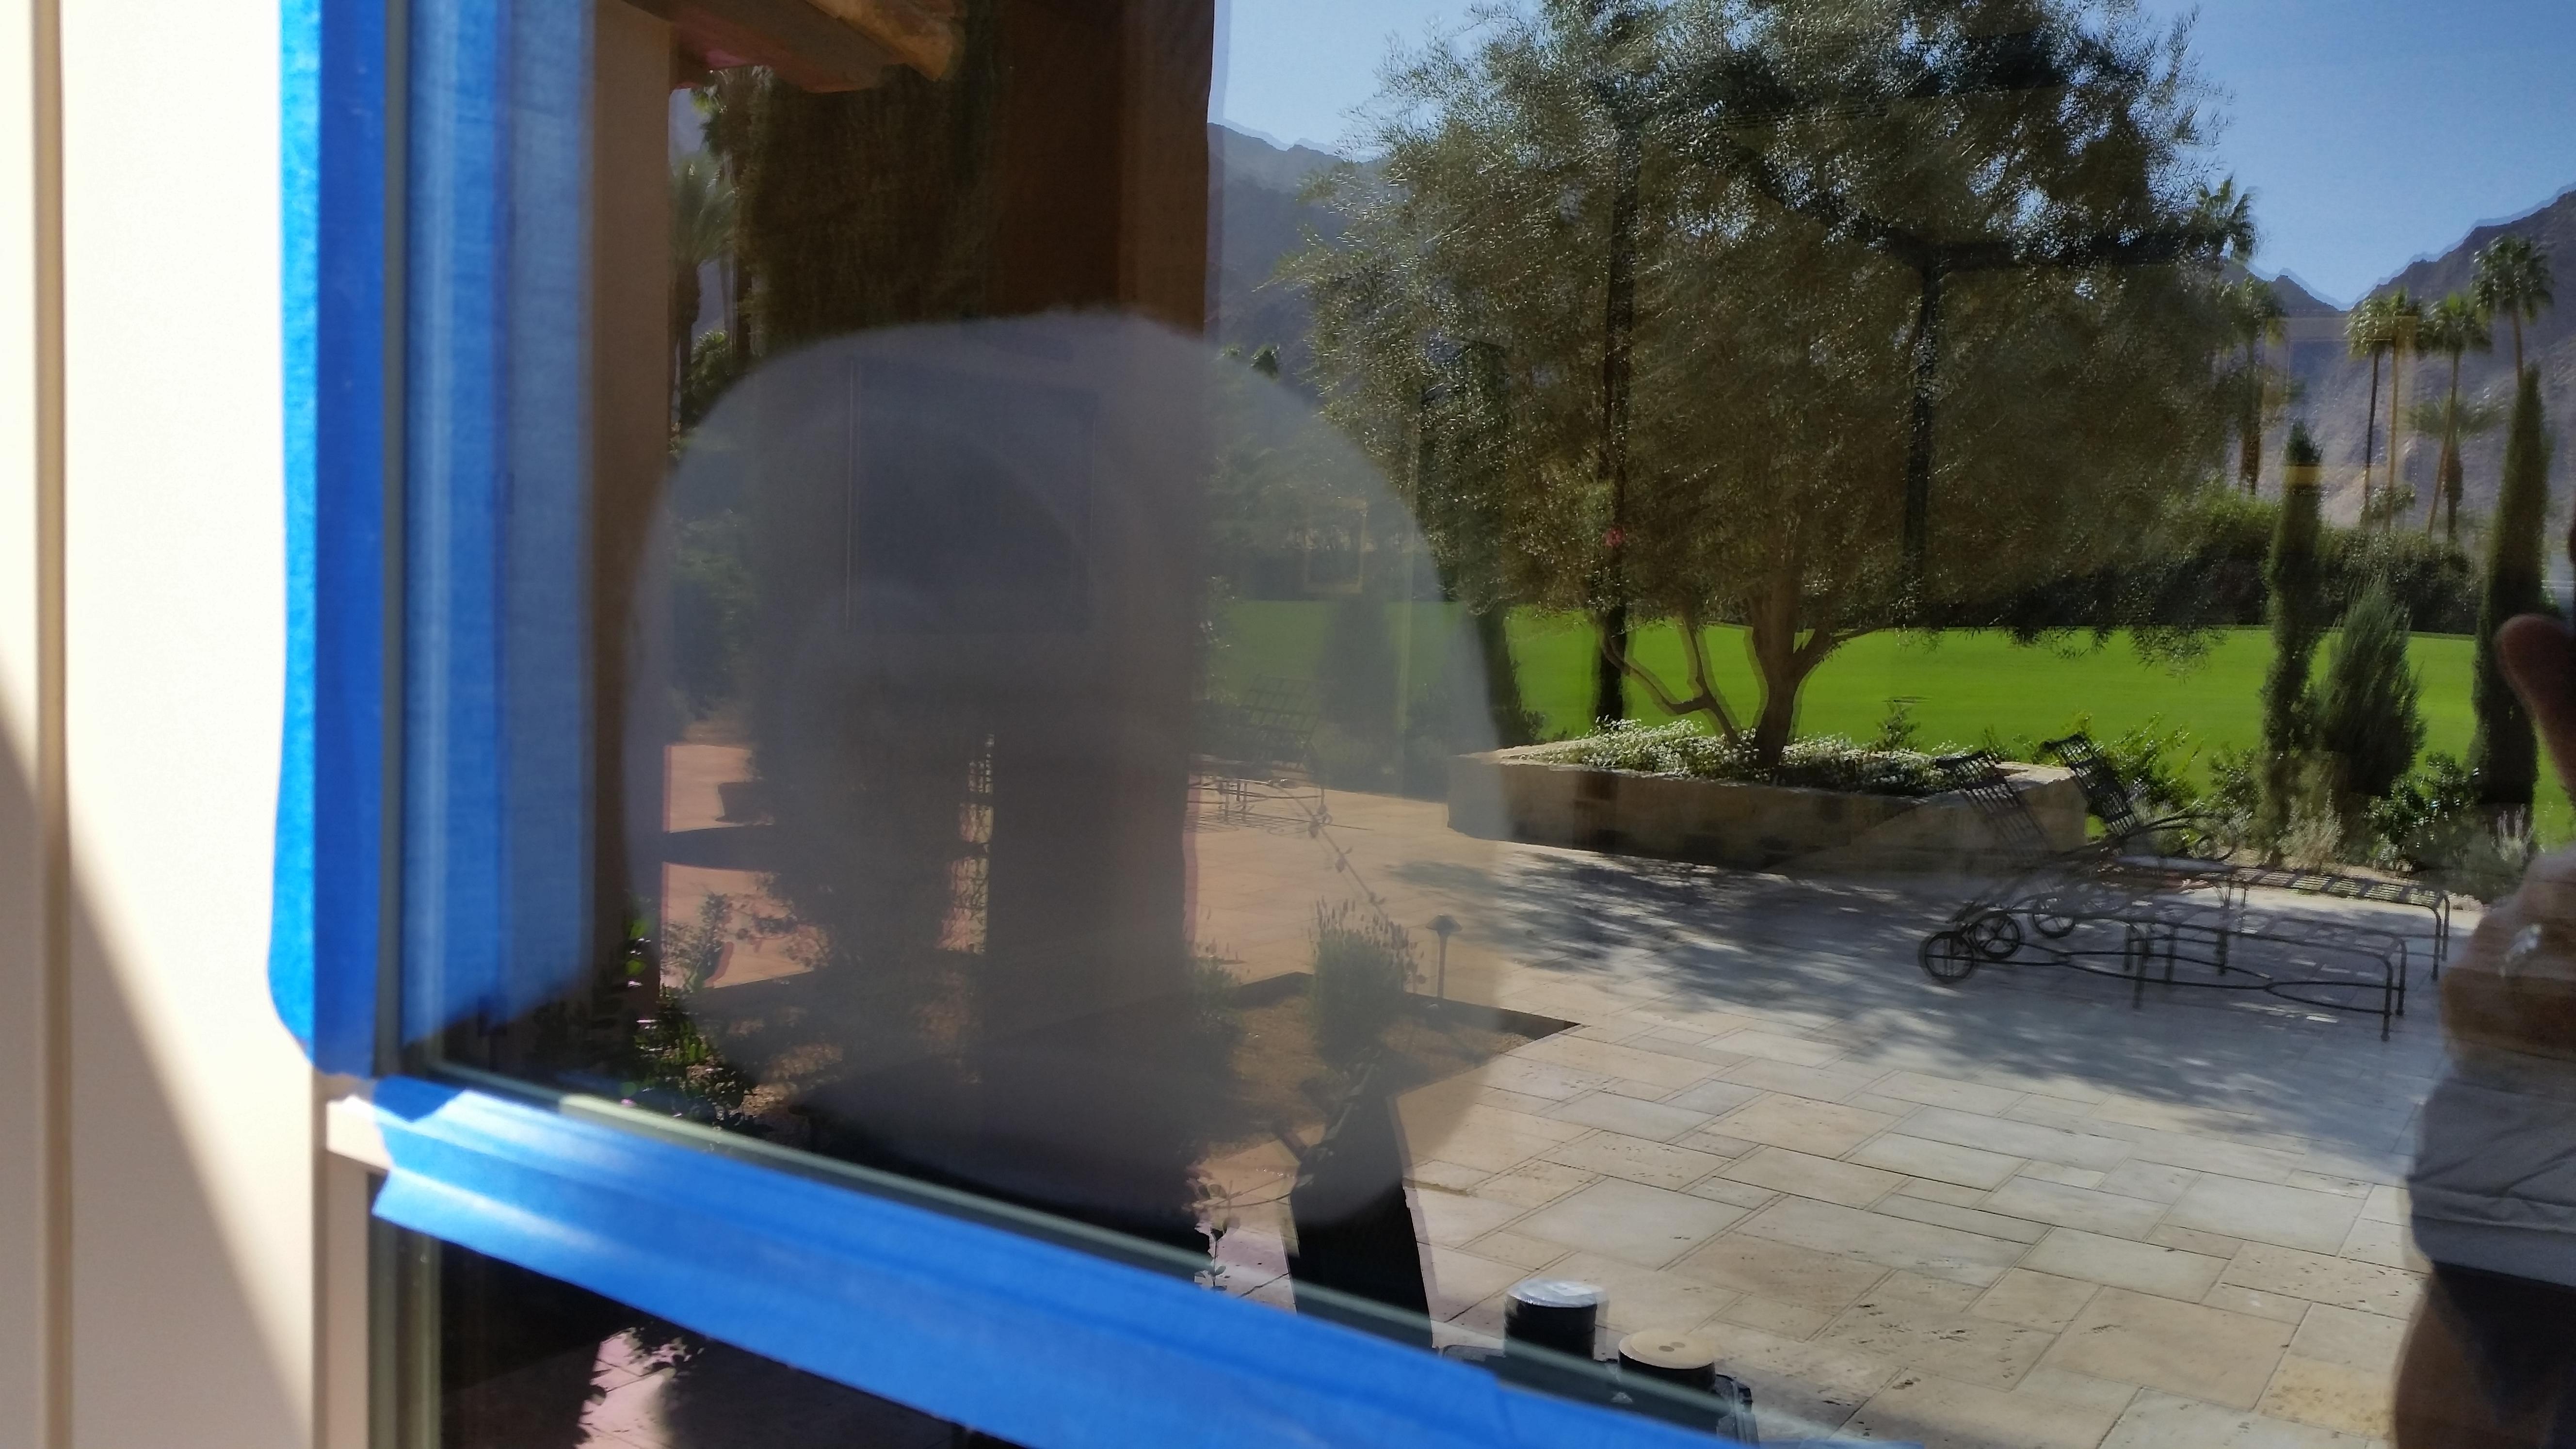 Diamon Fusion Scratch Removal Prevention By Brite Cleantrede